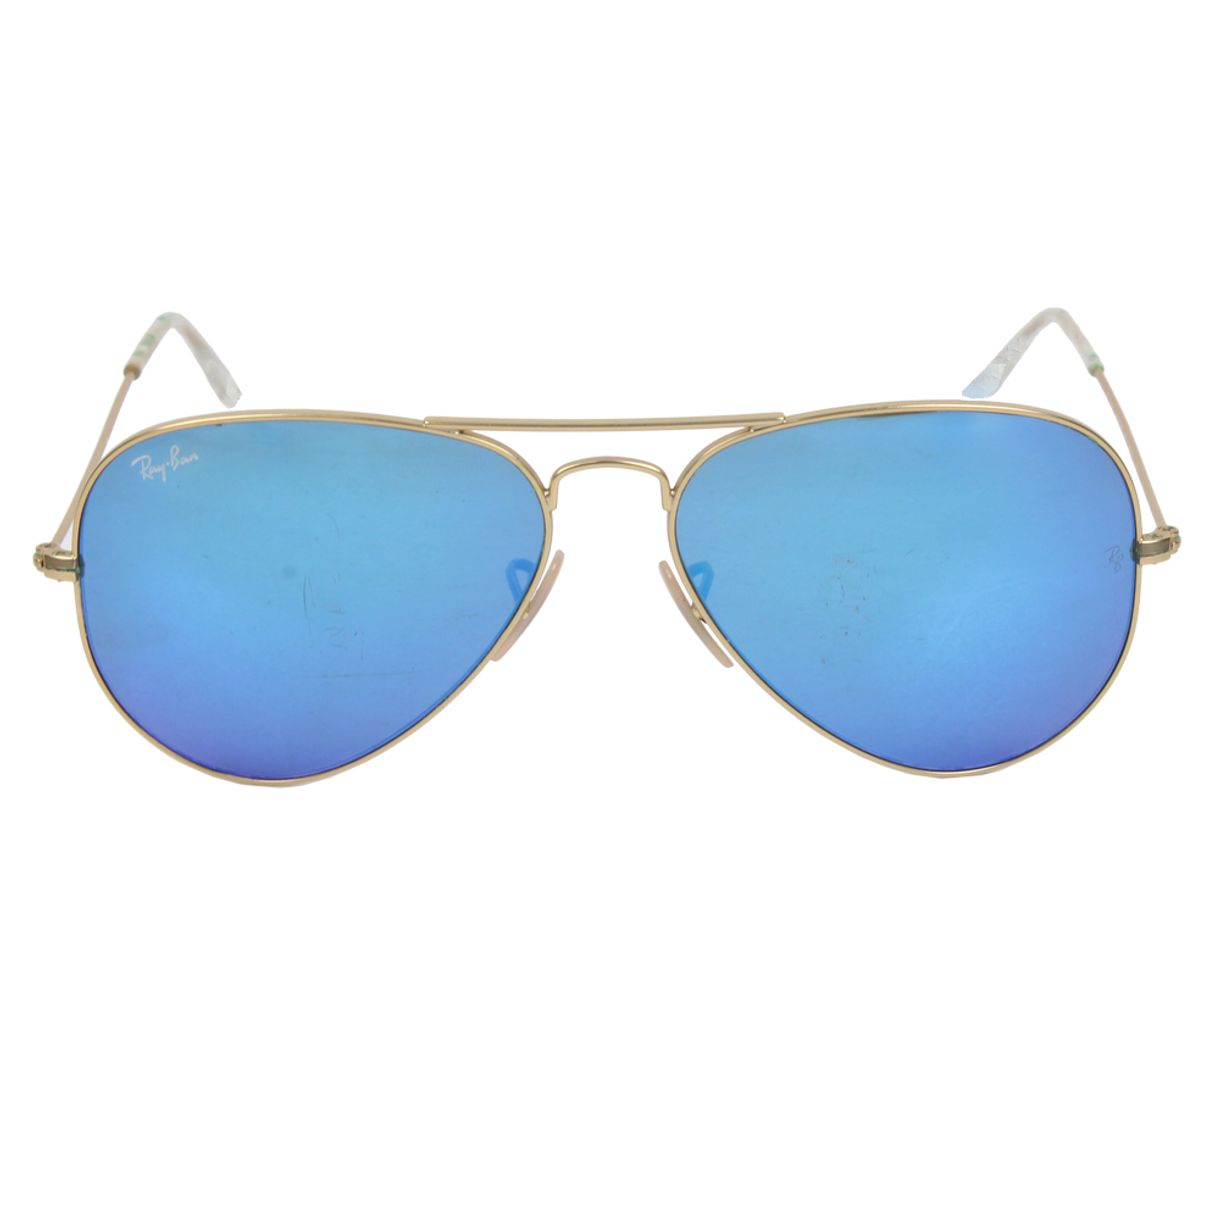 60394-oculos-ray-ban-aviator-azul-1